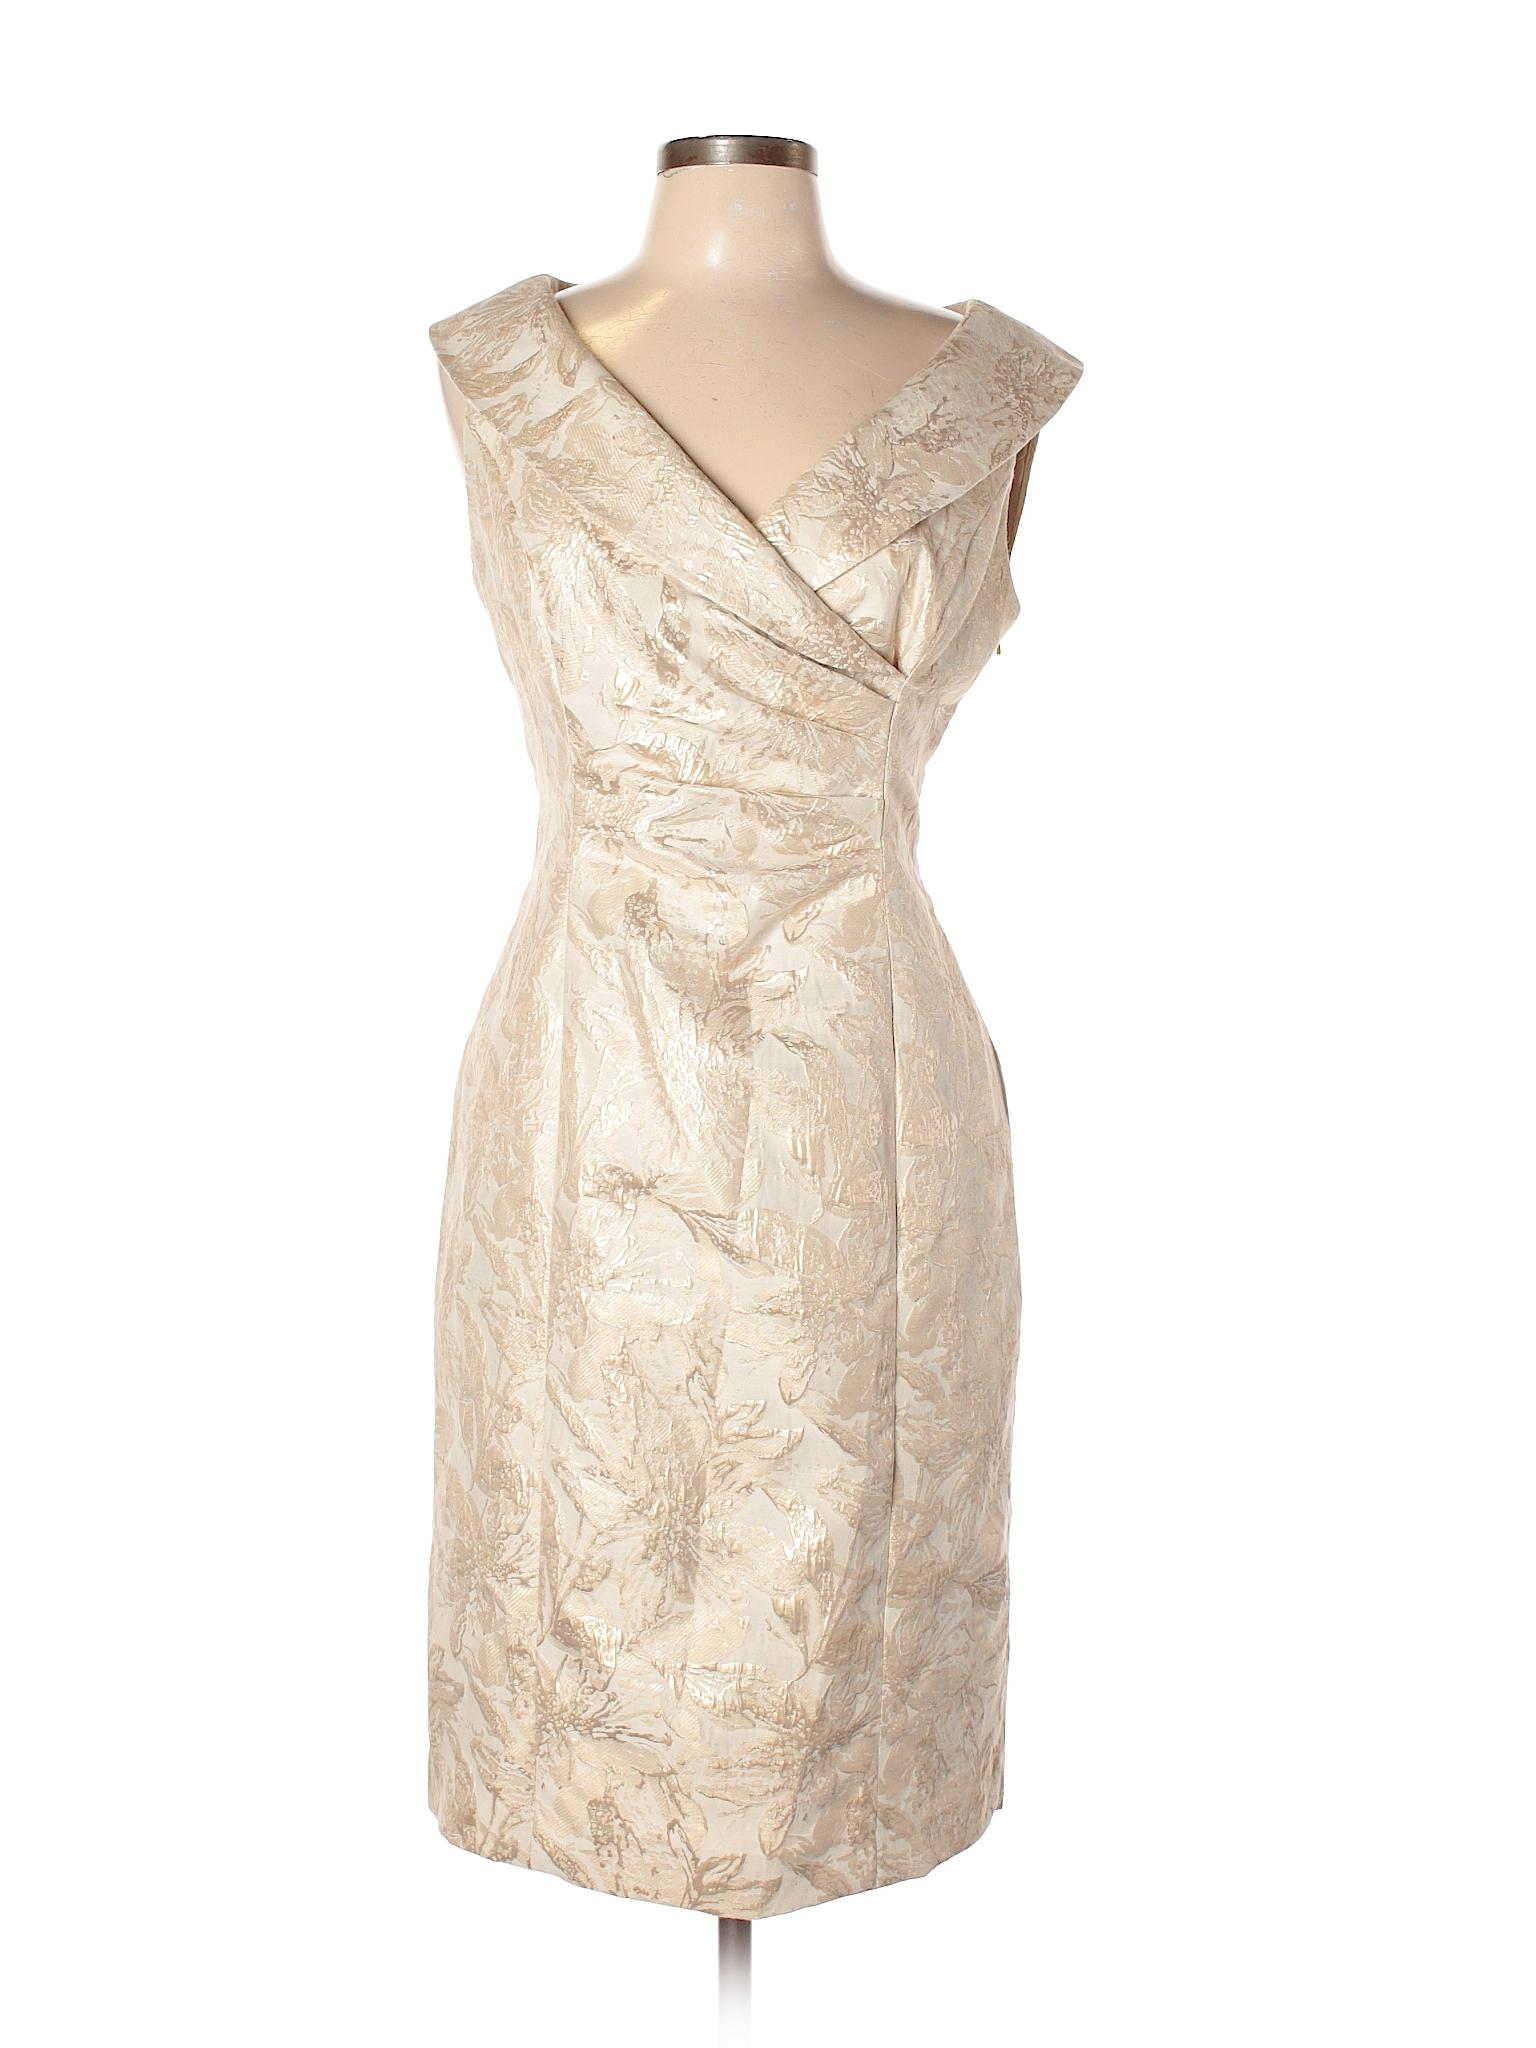 Evan Picone 100% Polyester Metallic Beige Cocktail Dress Size 12 ...